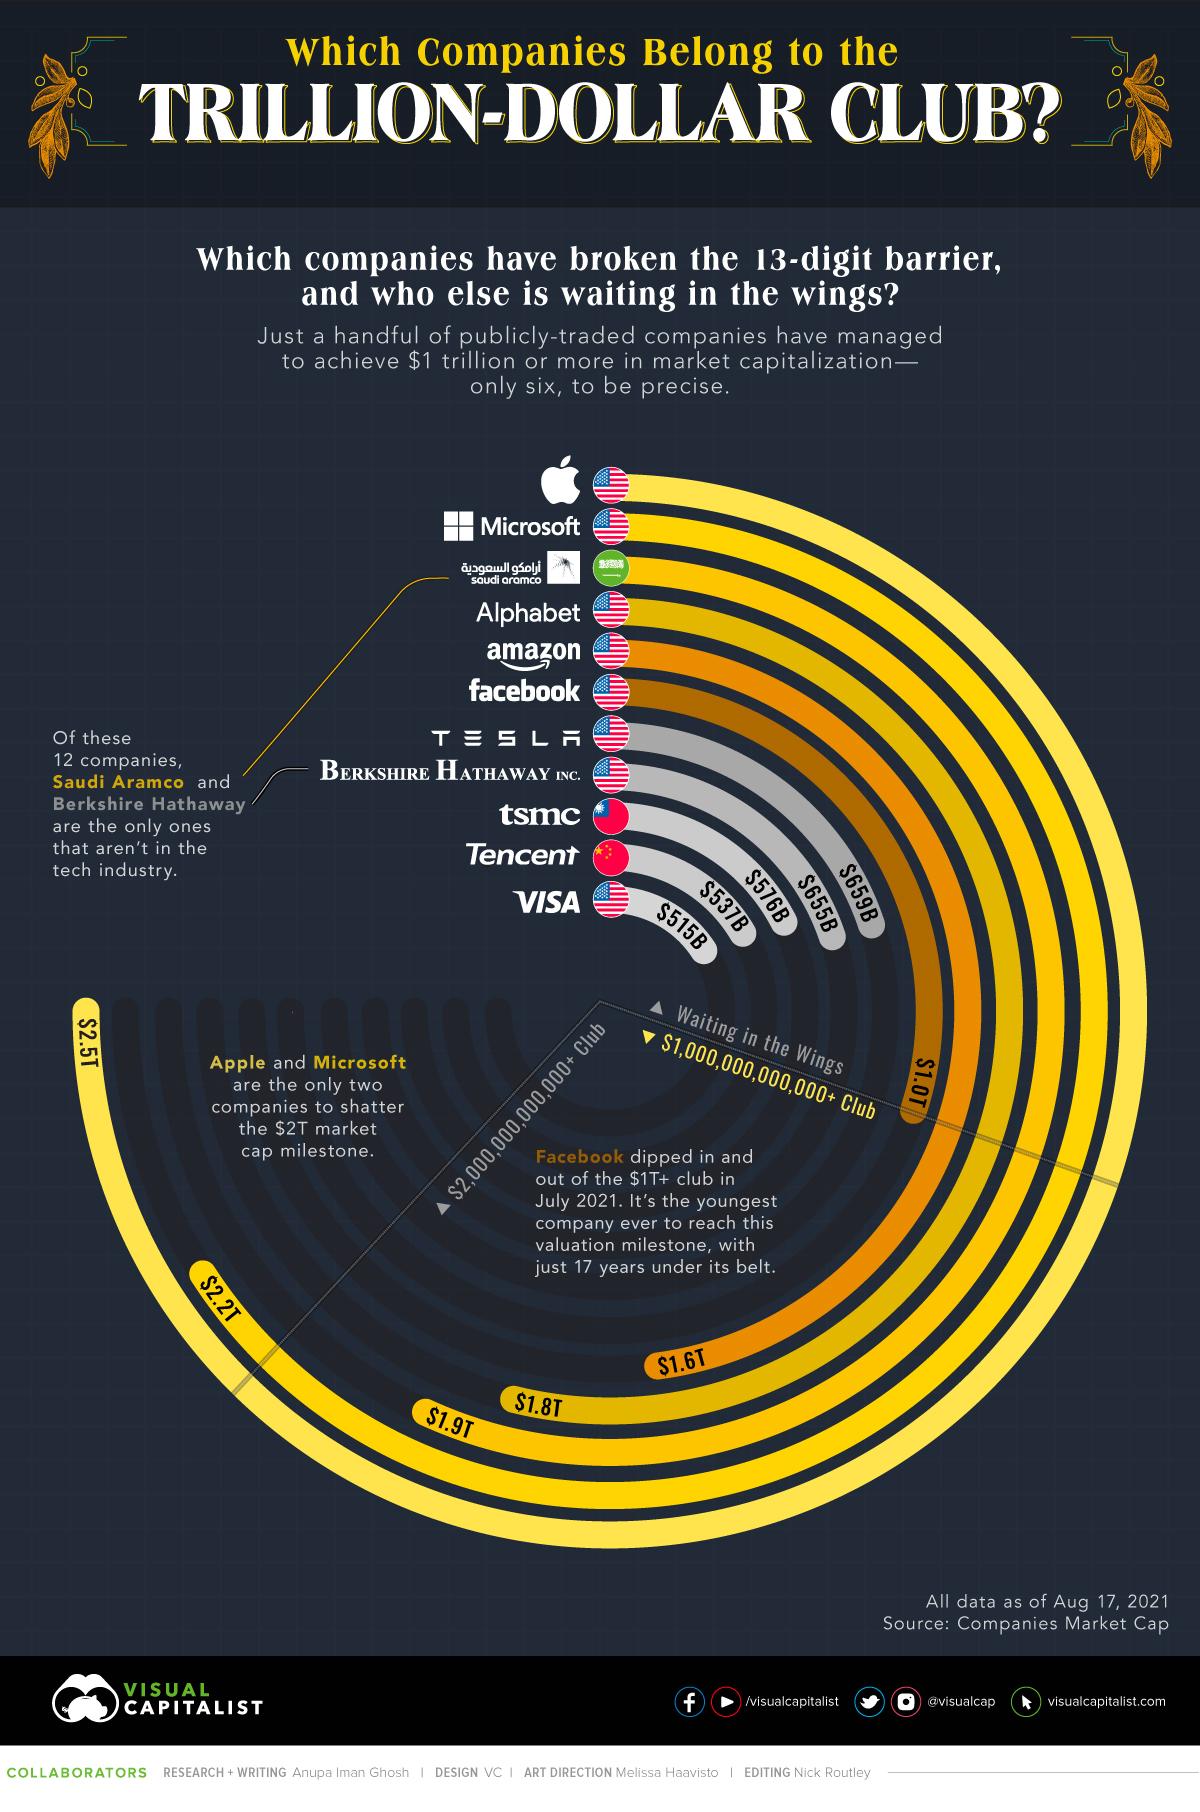 Companies in the Trillion-Dollar Club Main